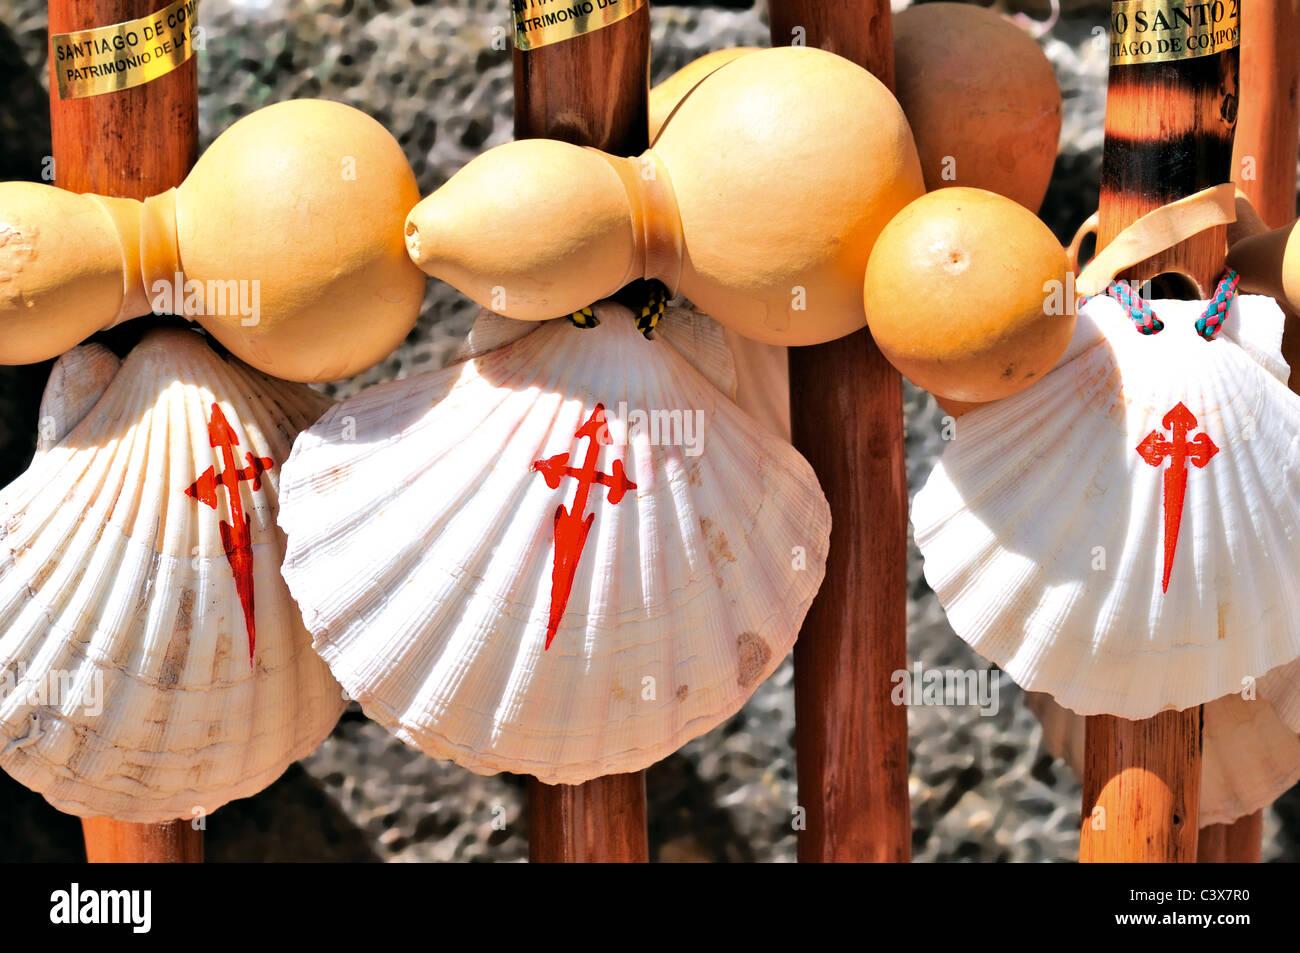 Spain, Galicia: Symbols of the Saint James Way pilgrimage to Santiago de Compostela - Stock Image